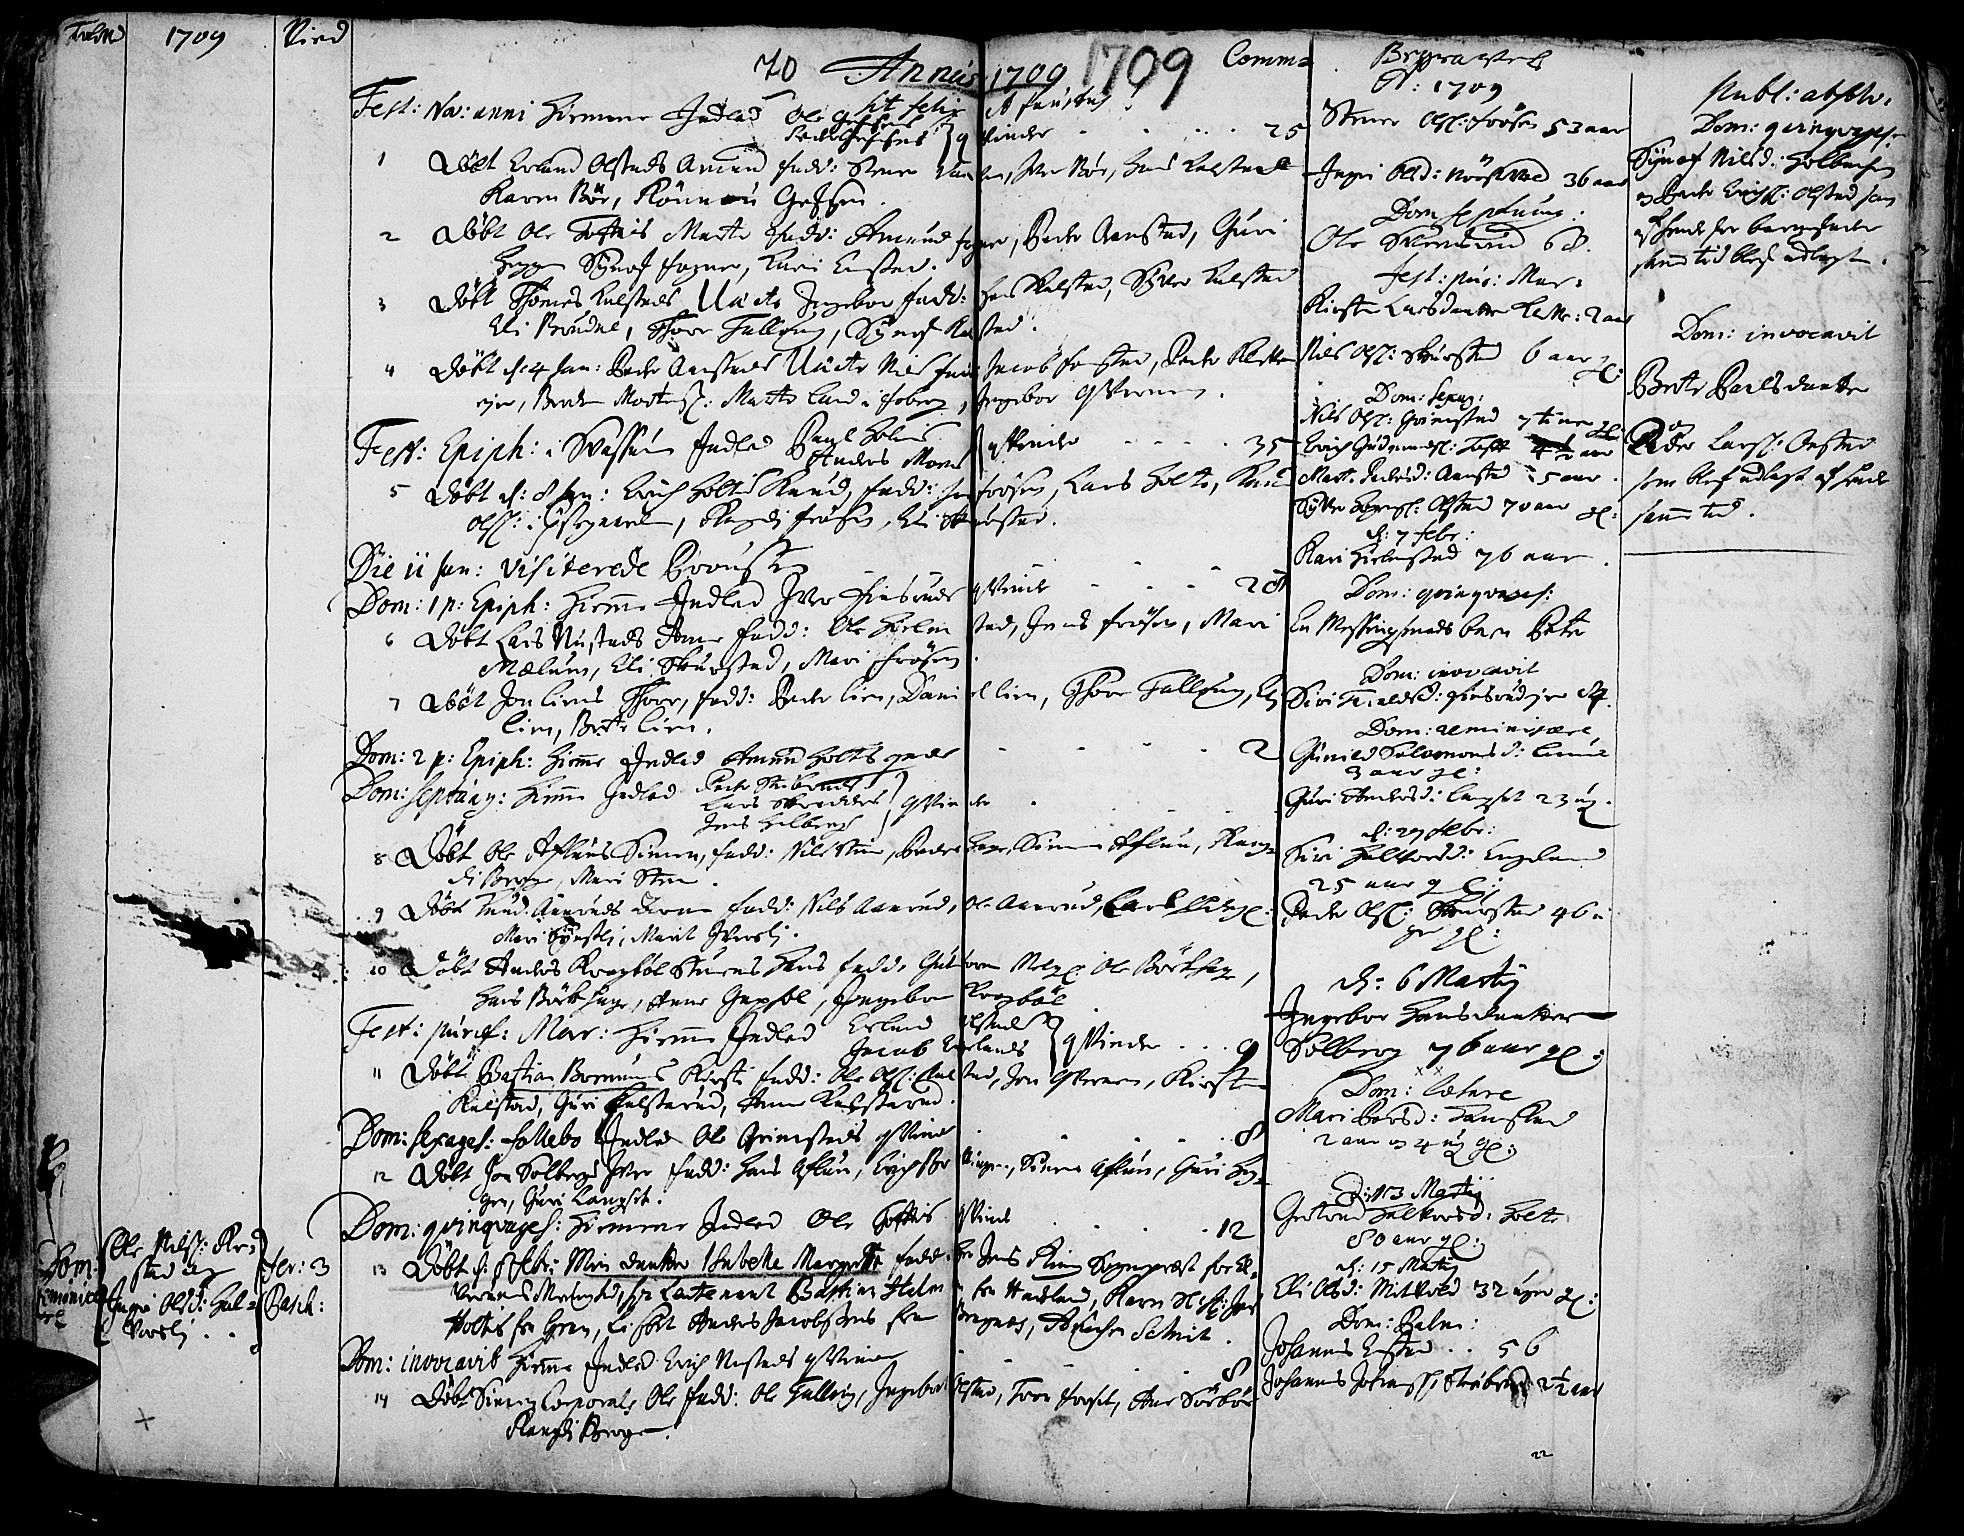 SAH, Gausdal prestekontor, Ministerialbok nr. 1, 1693-1728, s. 70